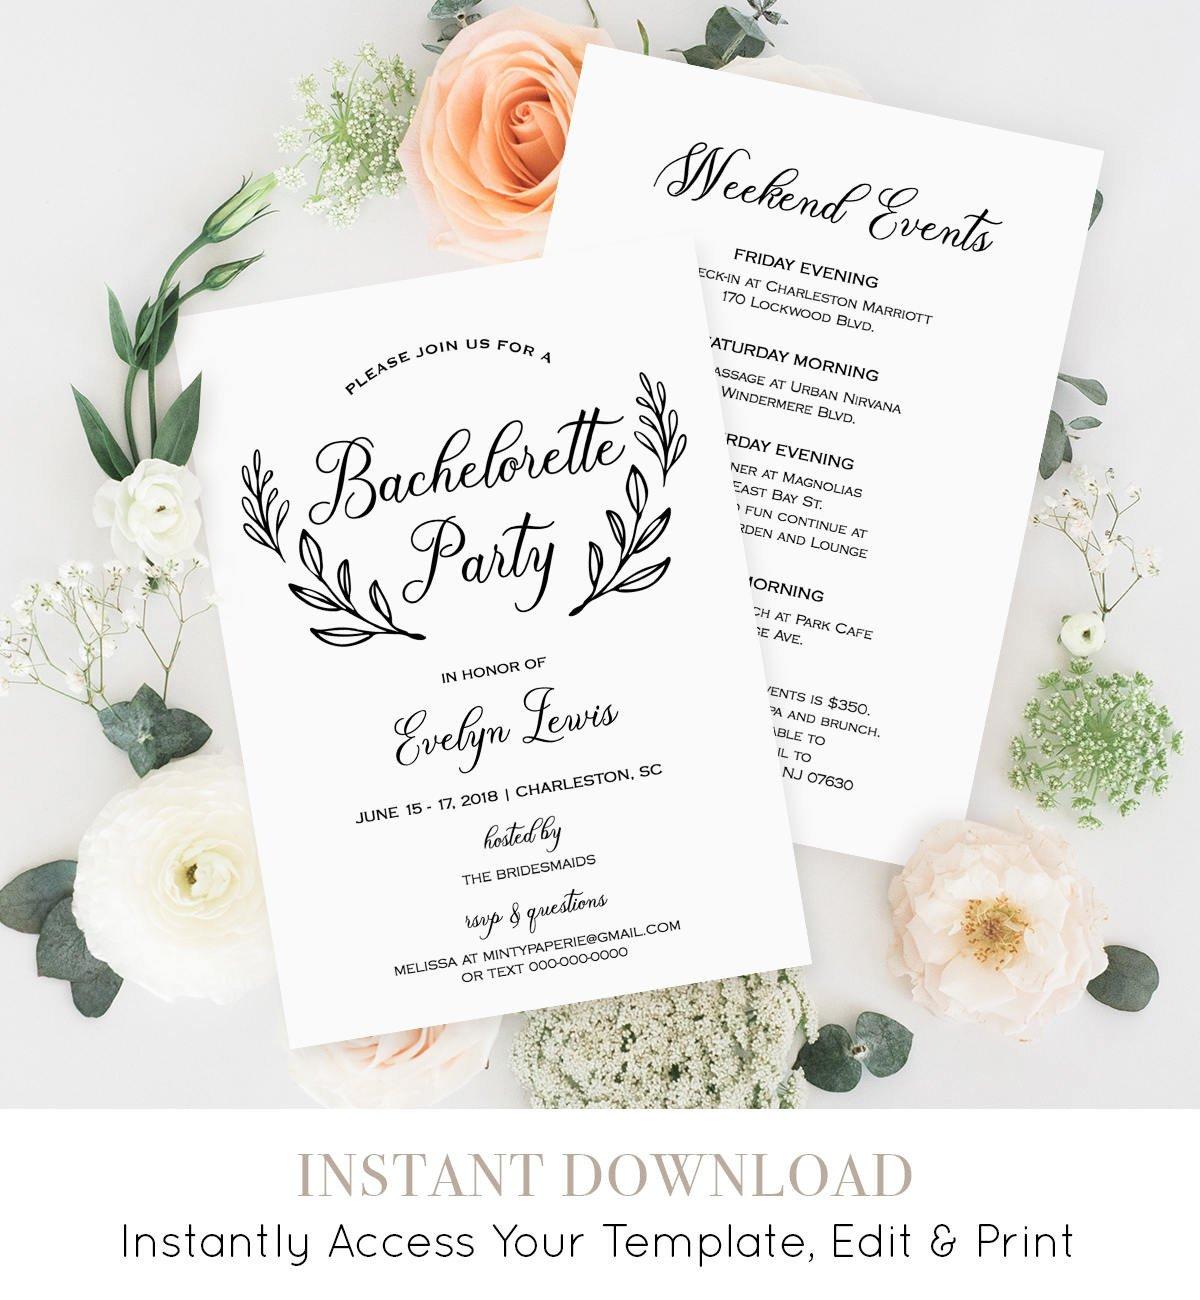 Bachelorette Itinerary Template Free Bachelorette Party Invitation Template Printable